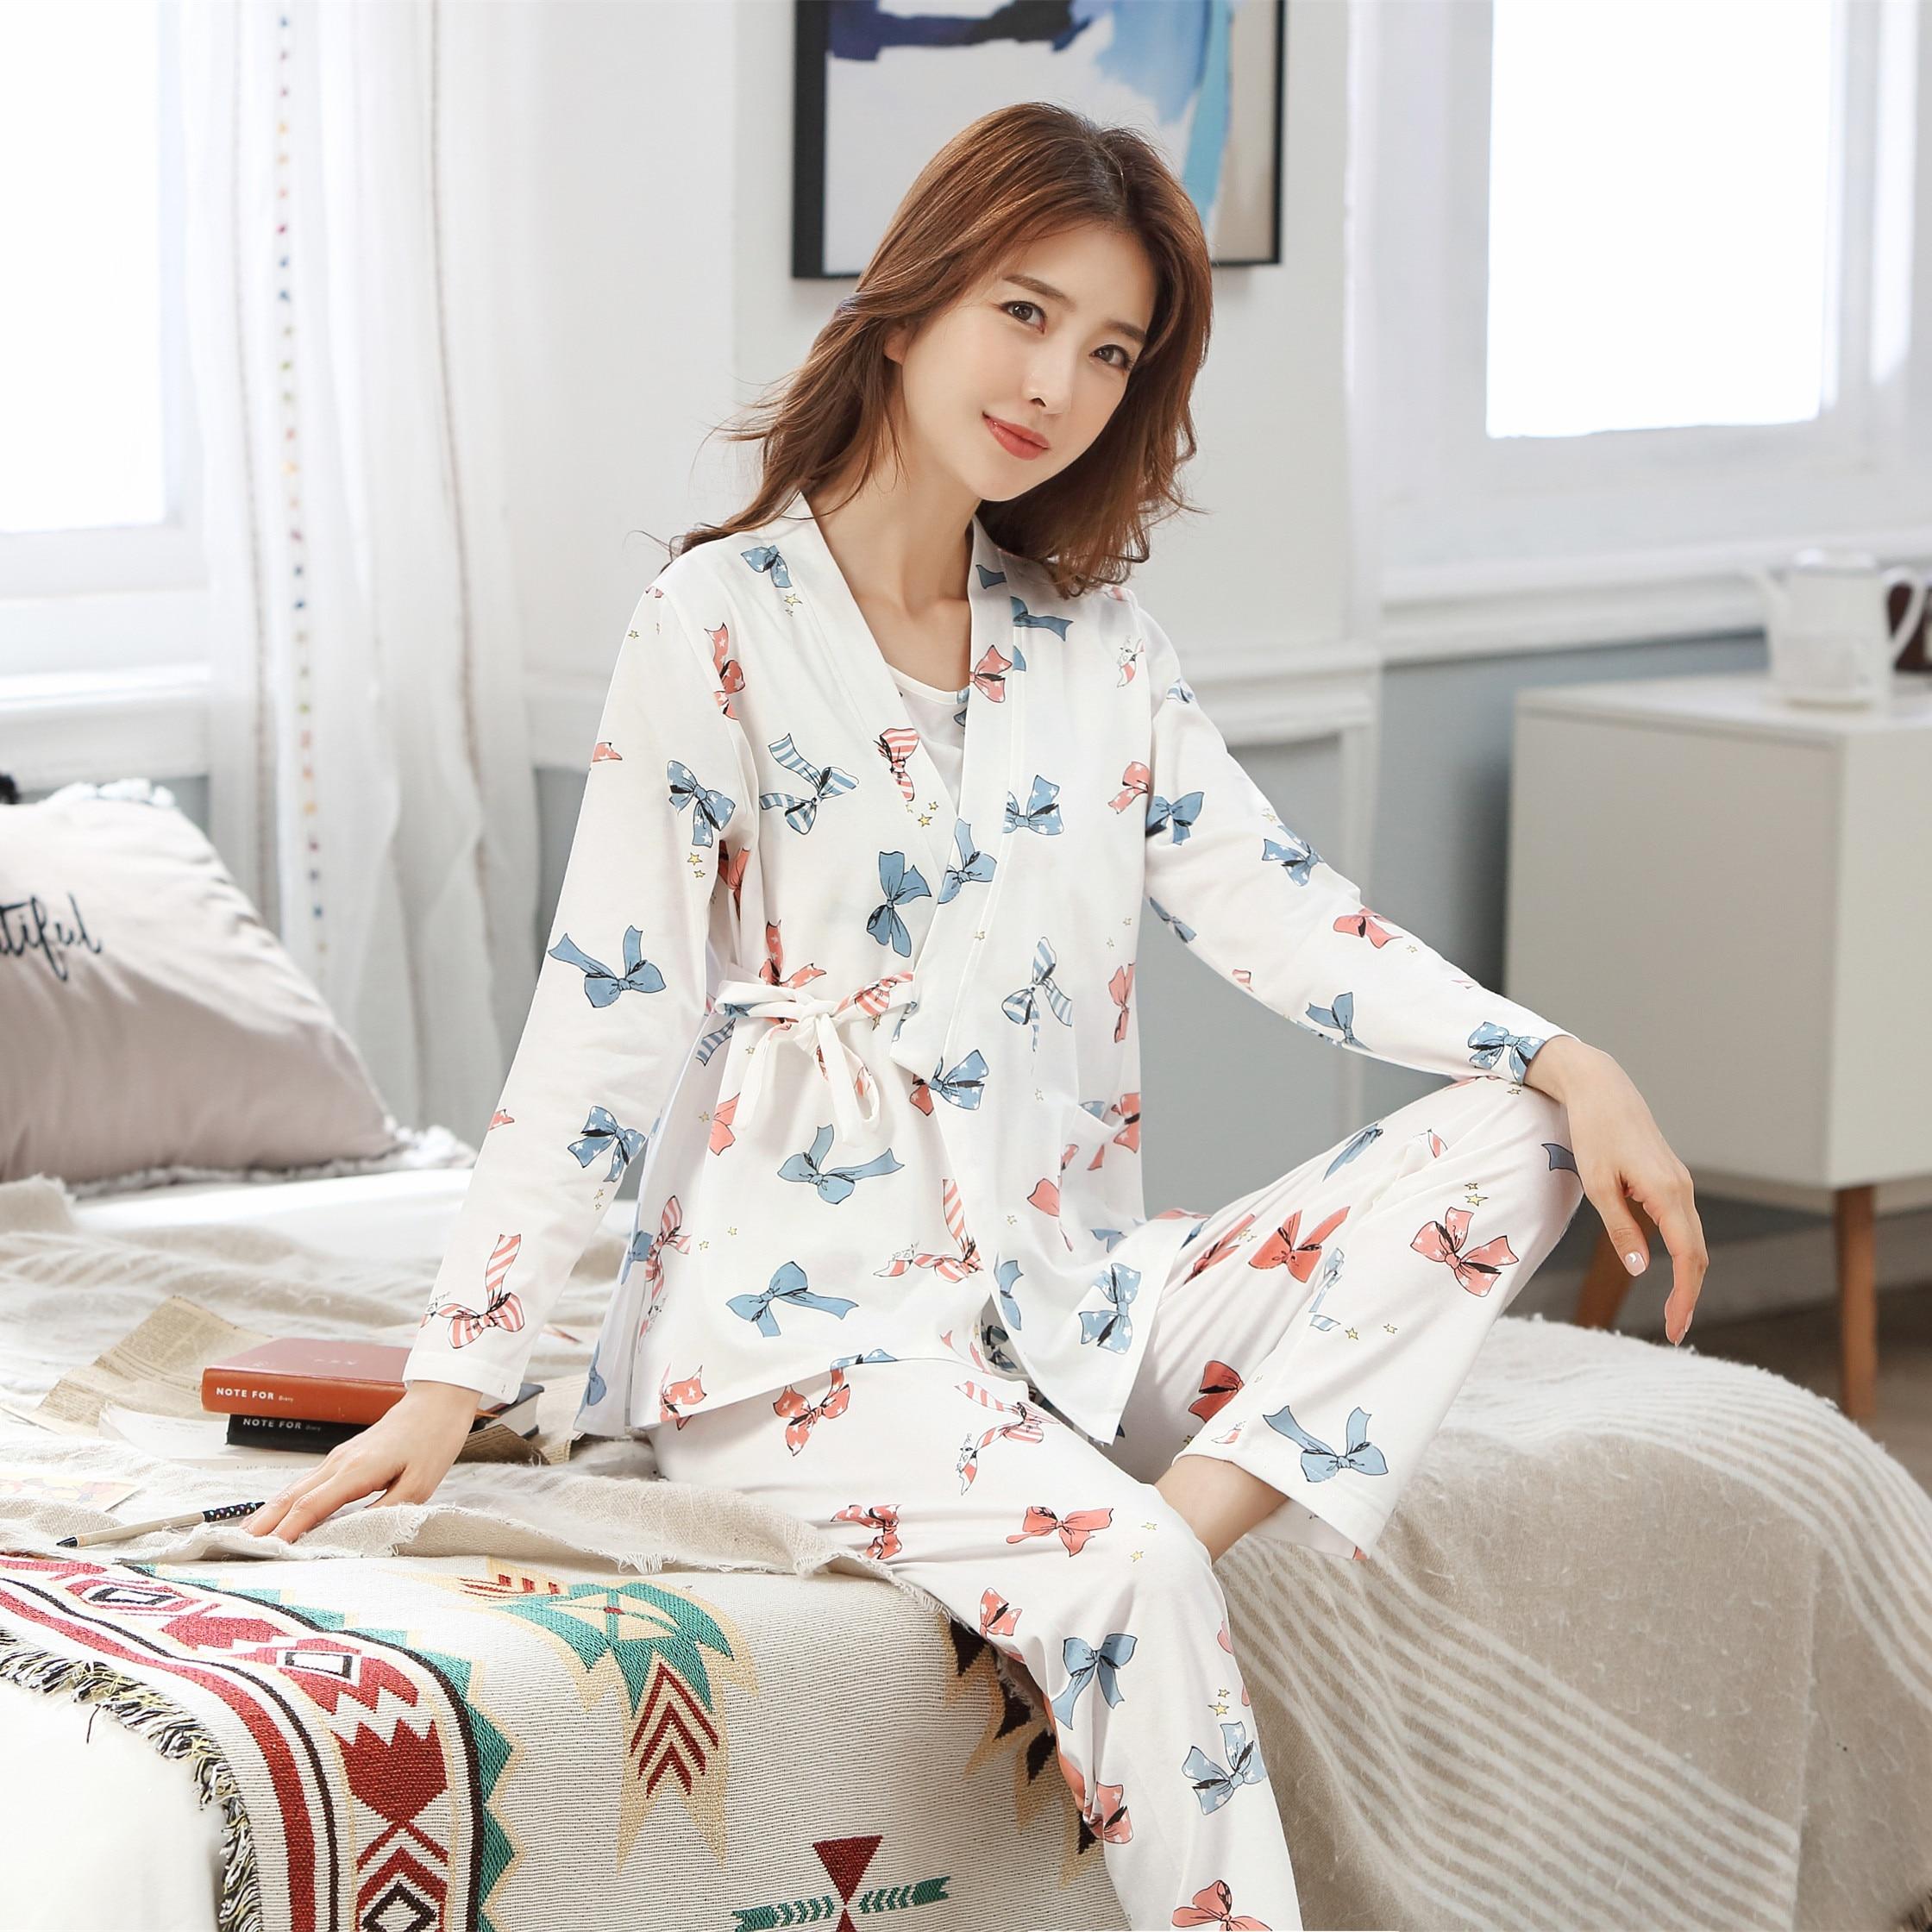 3 PCs/Set Printed Maternity Nursing Sleepwear Breastfeeding Nightwear for Pregnant Women Pregnancy Breast Feeding Pajamas Suits